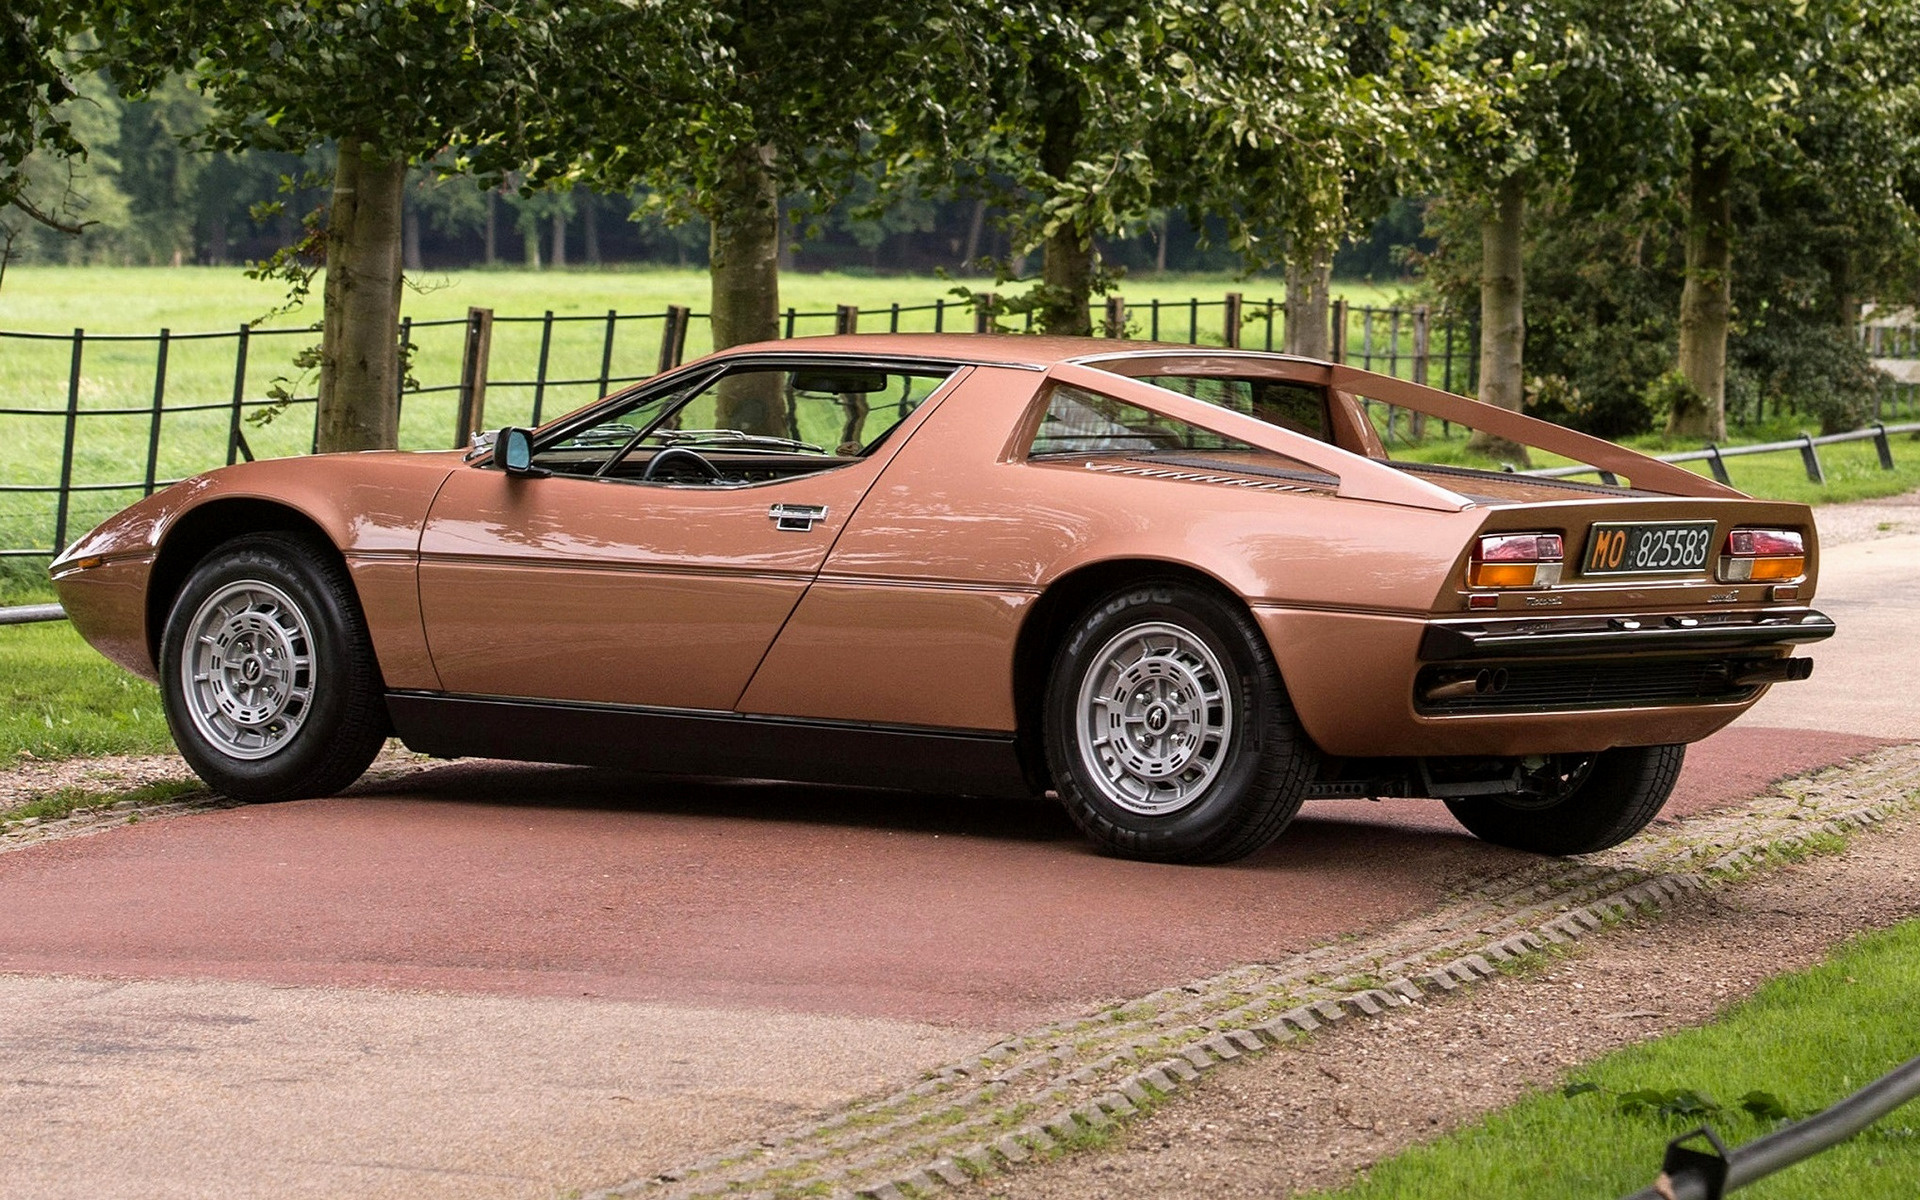 1977 Maserati Merak 2000 GT - Wallpapers and HD Images ...